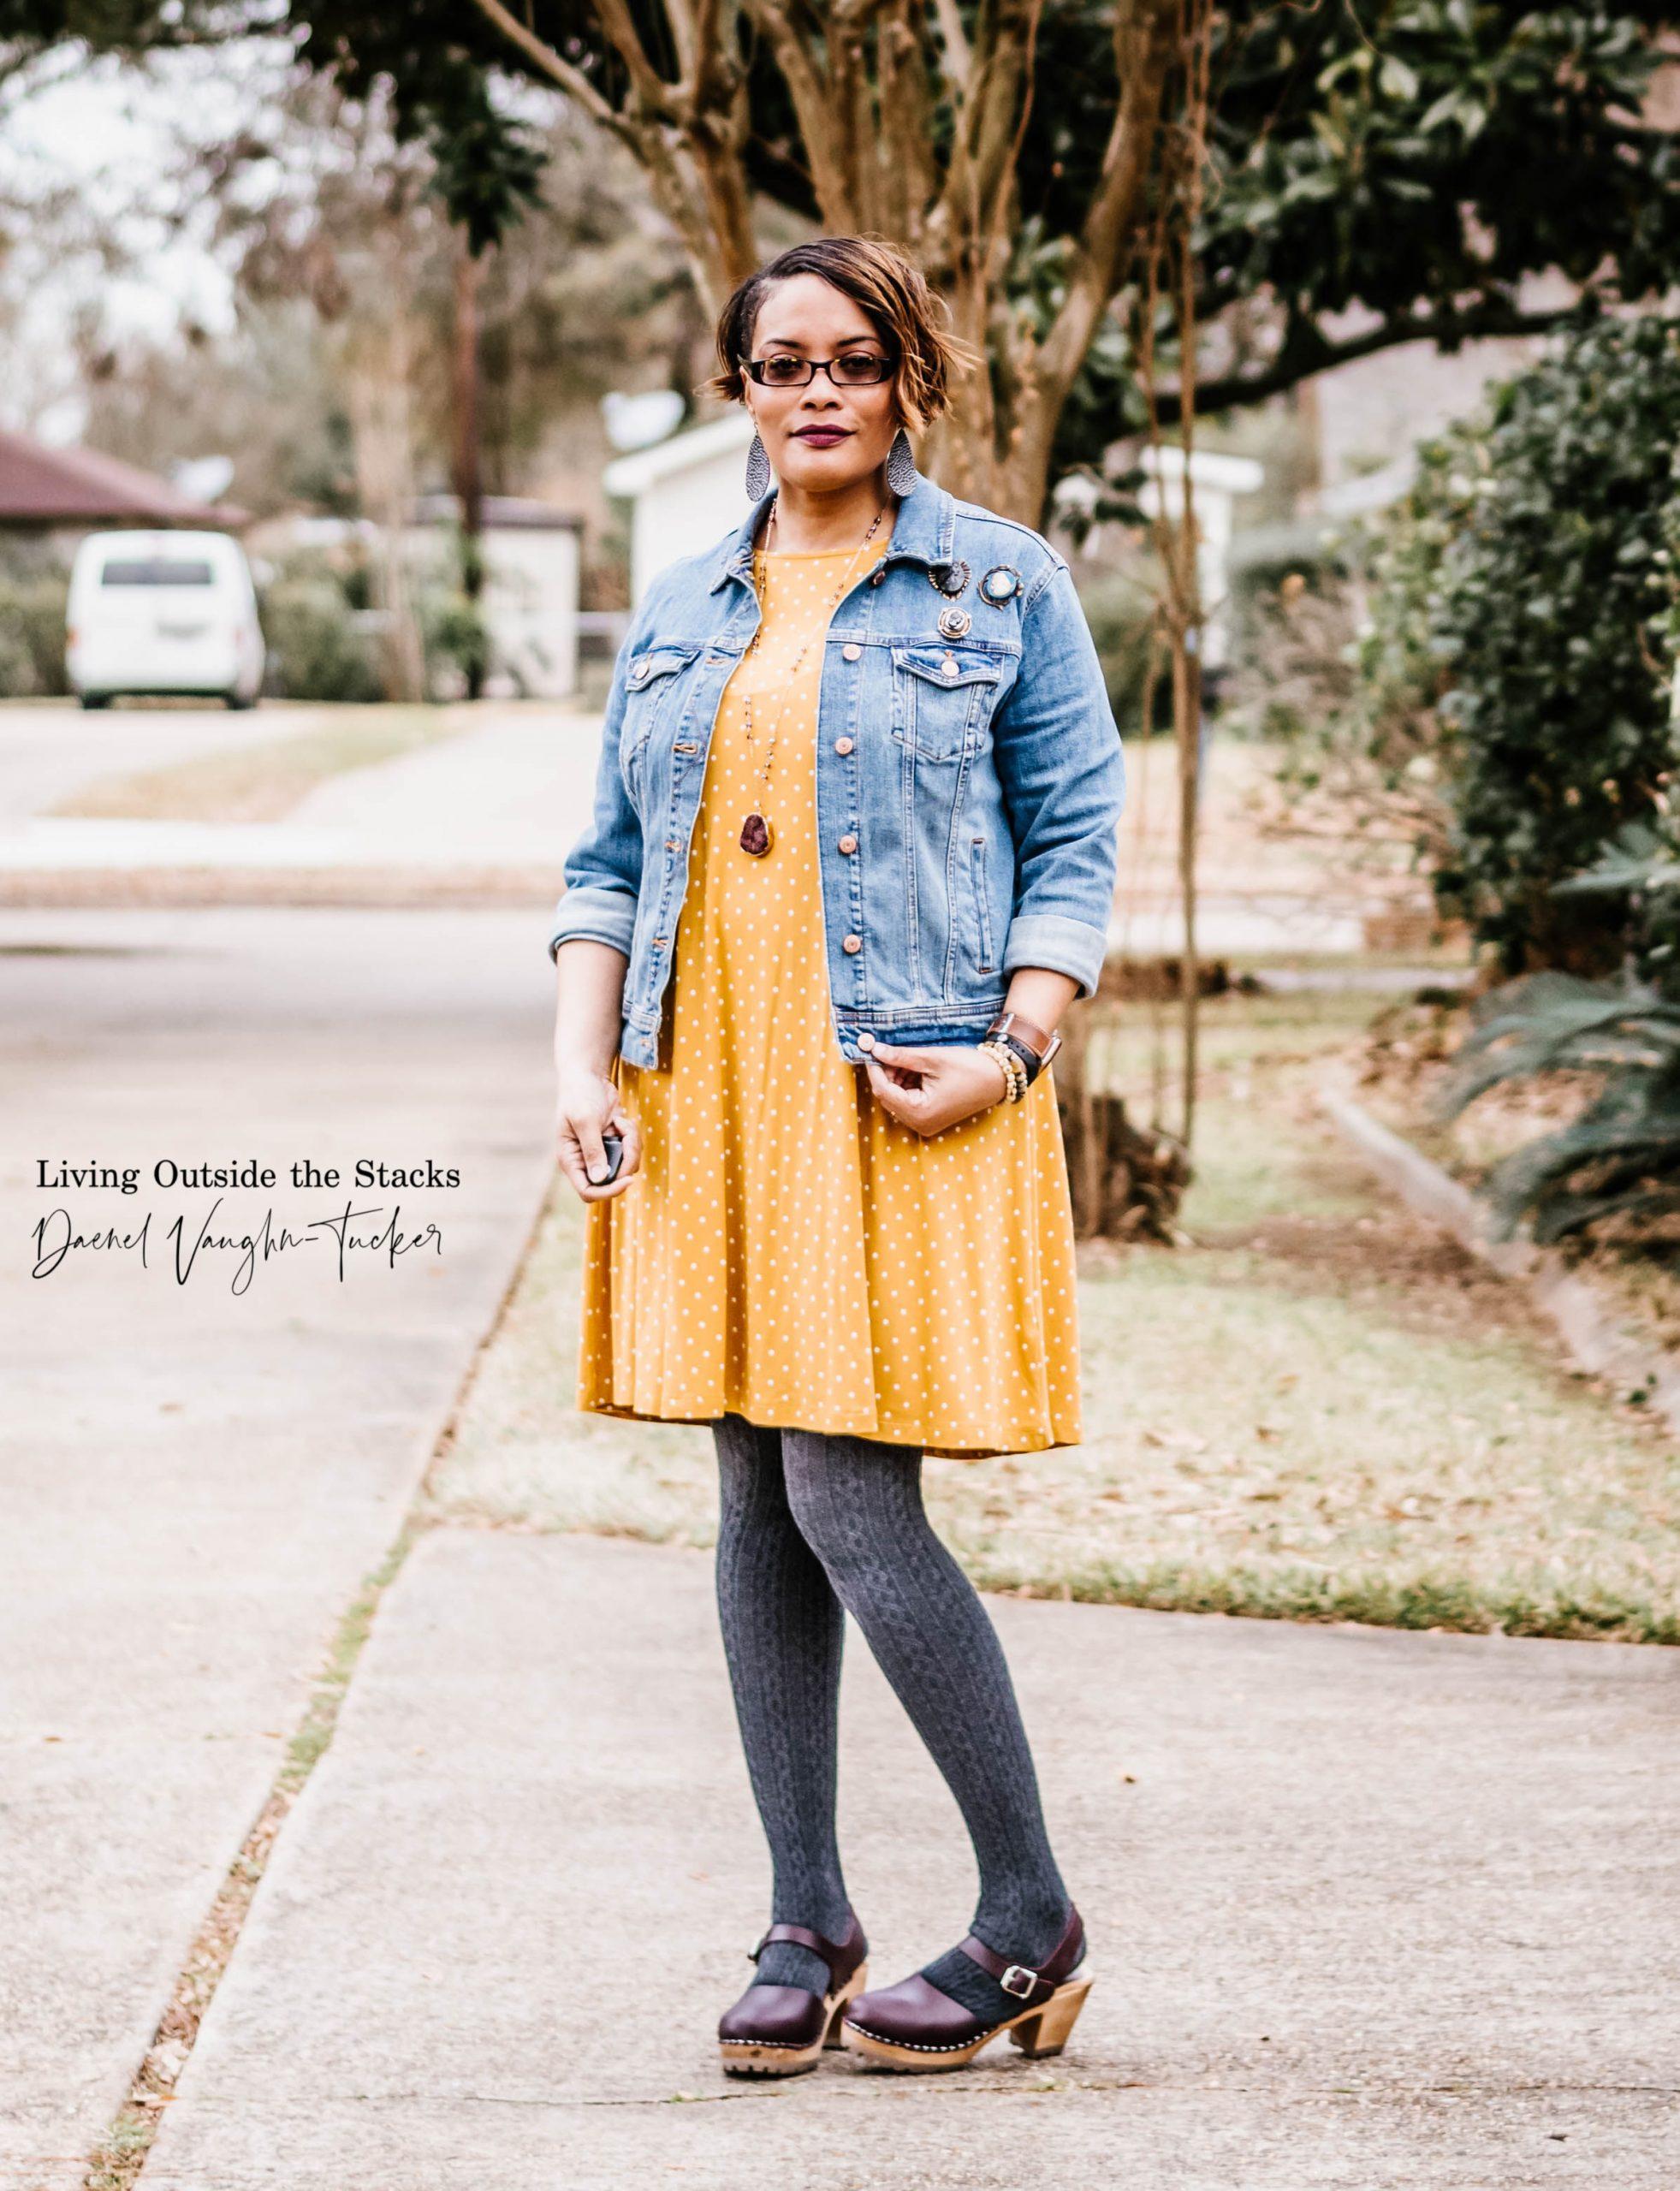 Denim Jacket Polka Dot Dress Gray Tights Clogs {living outside the stacks}